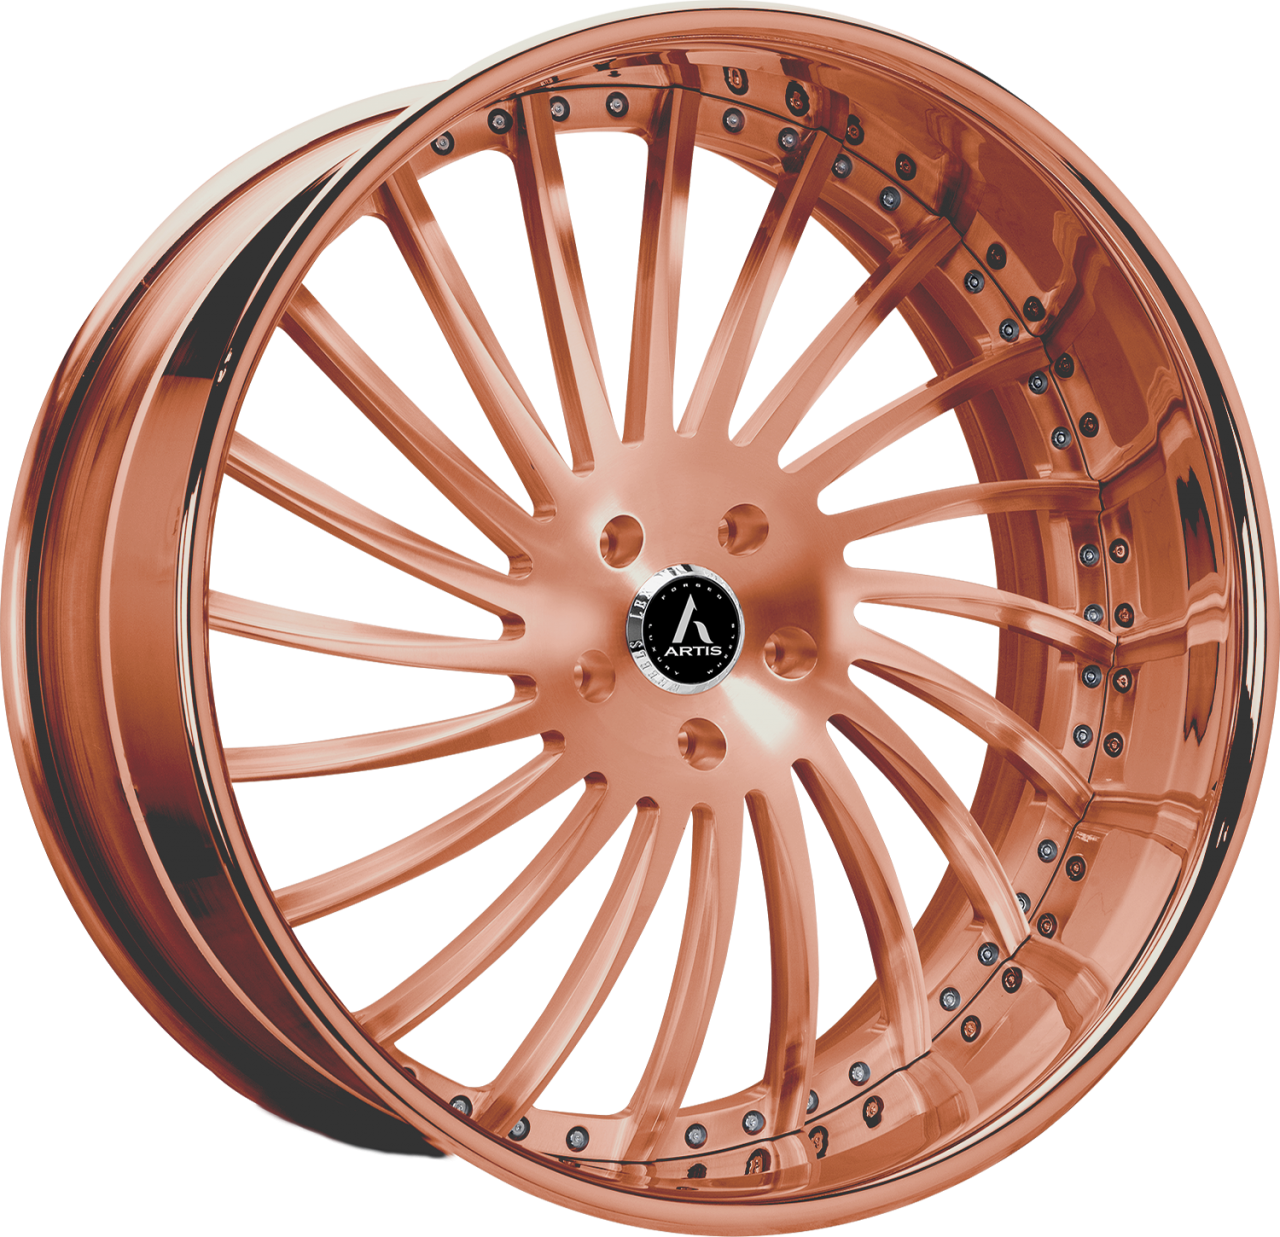 Artis Forged International wheel with Custom Rose Gold finish